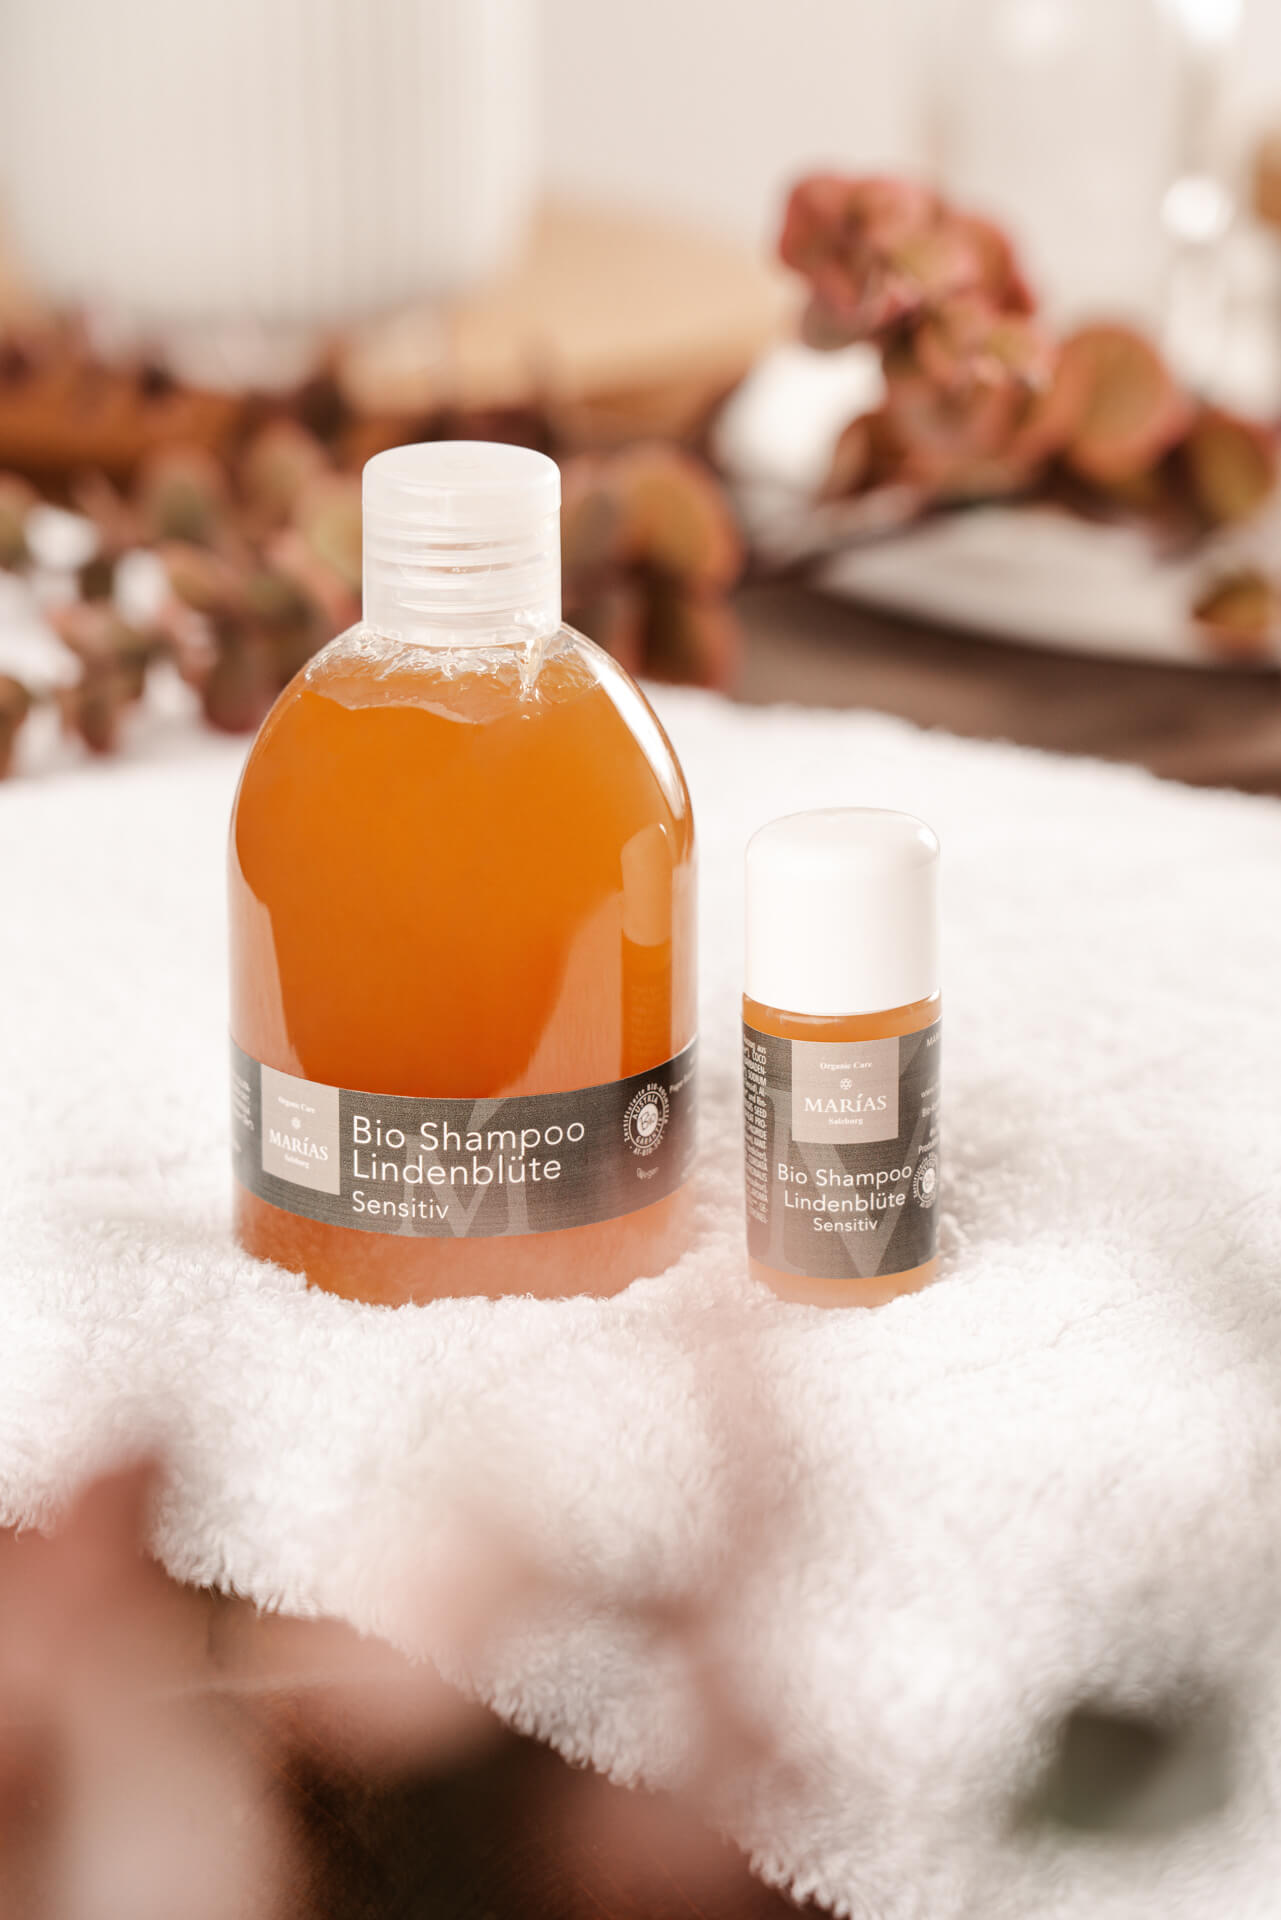 Marias-Bio Shampoo Lindenbluete Sensitive |Konzept H